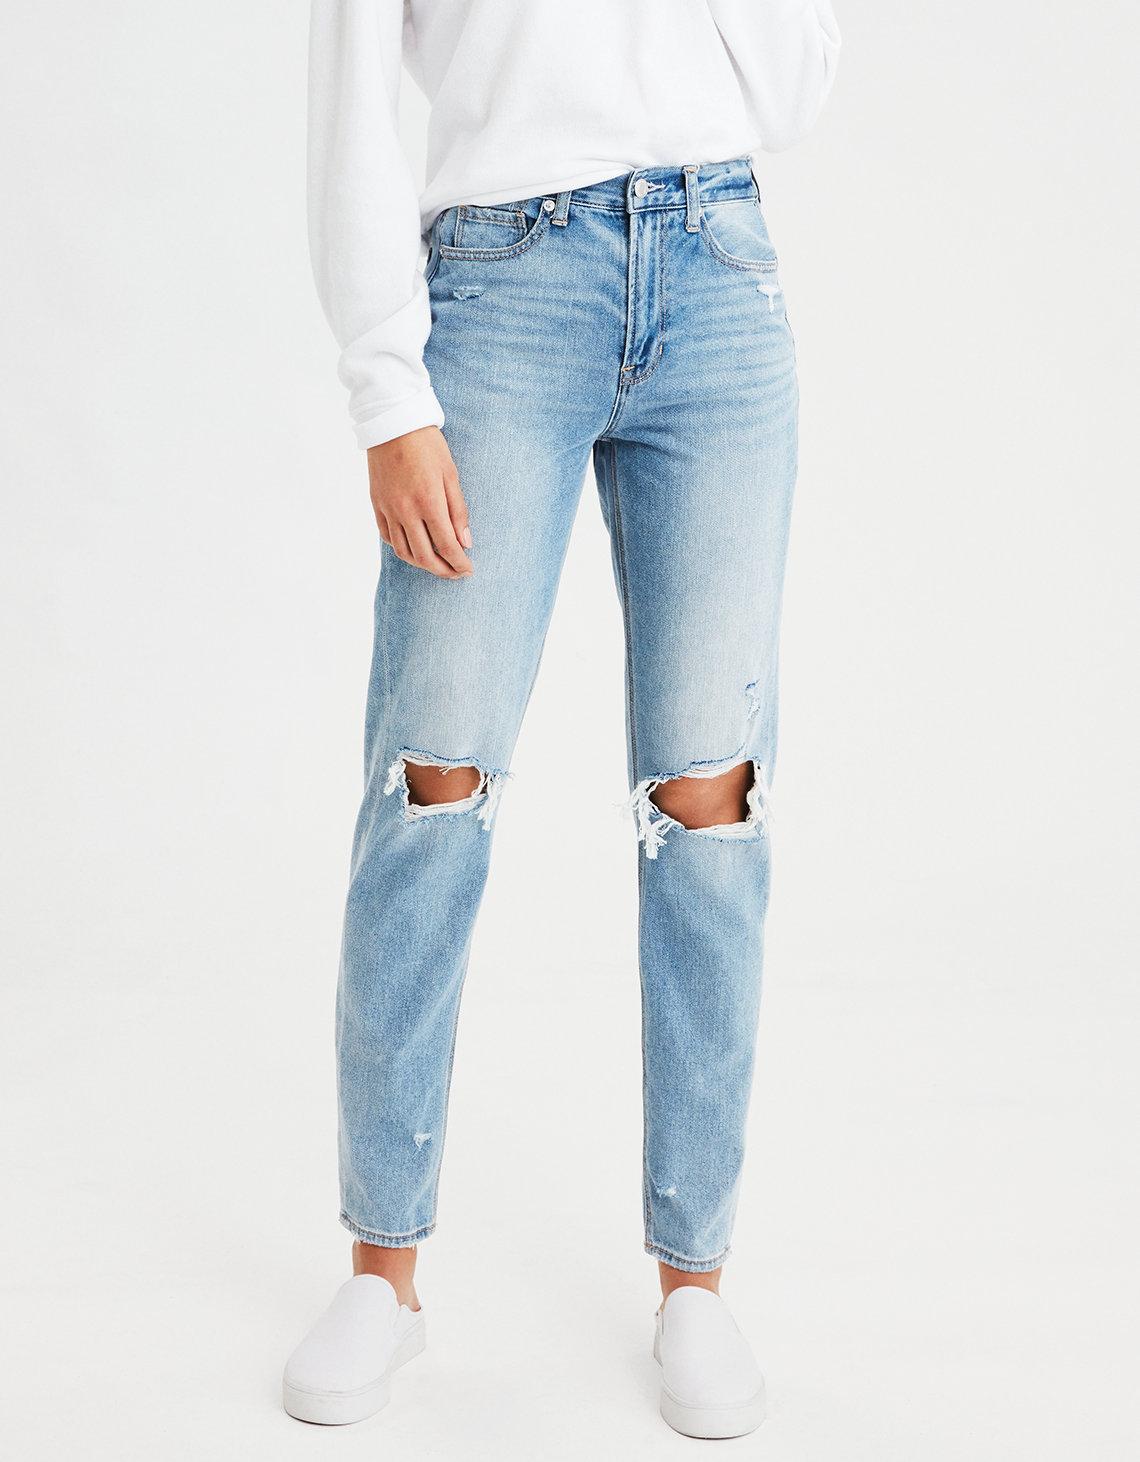 AE jeans.jpg